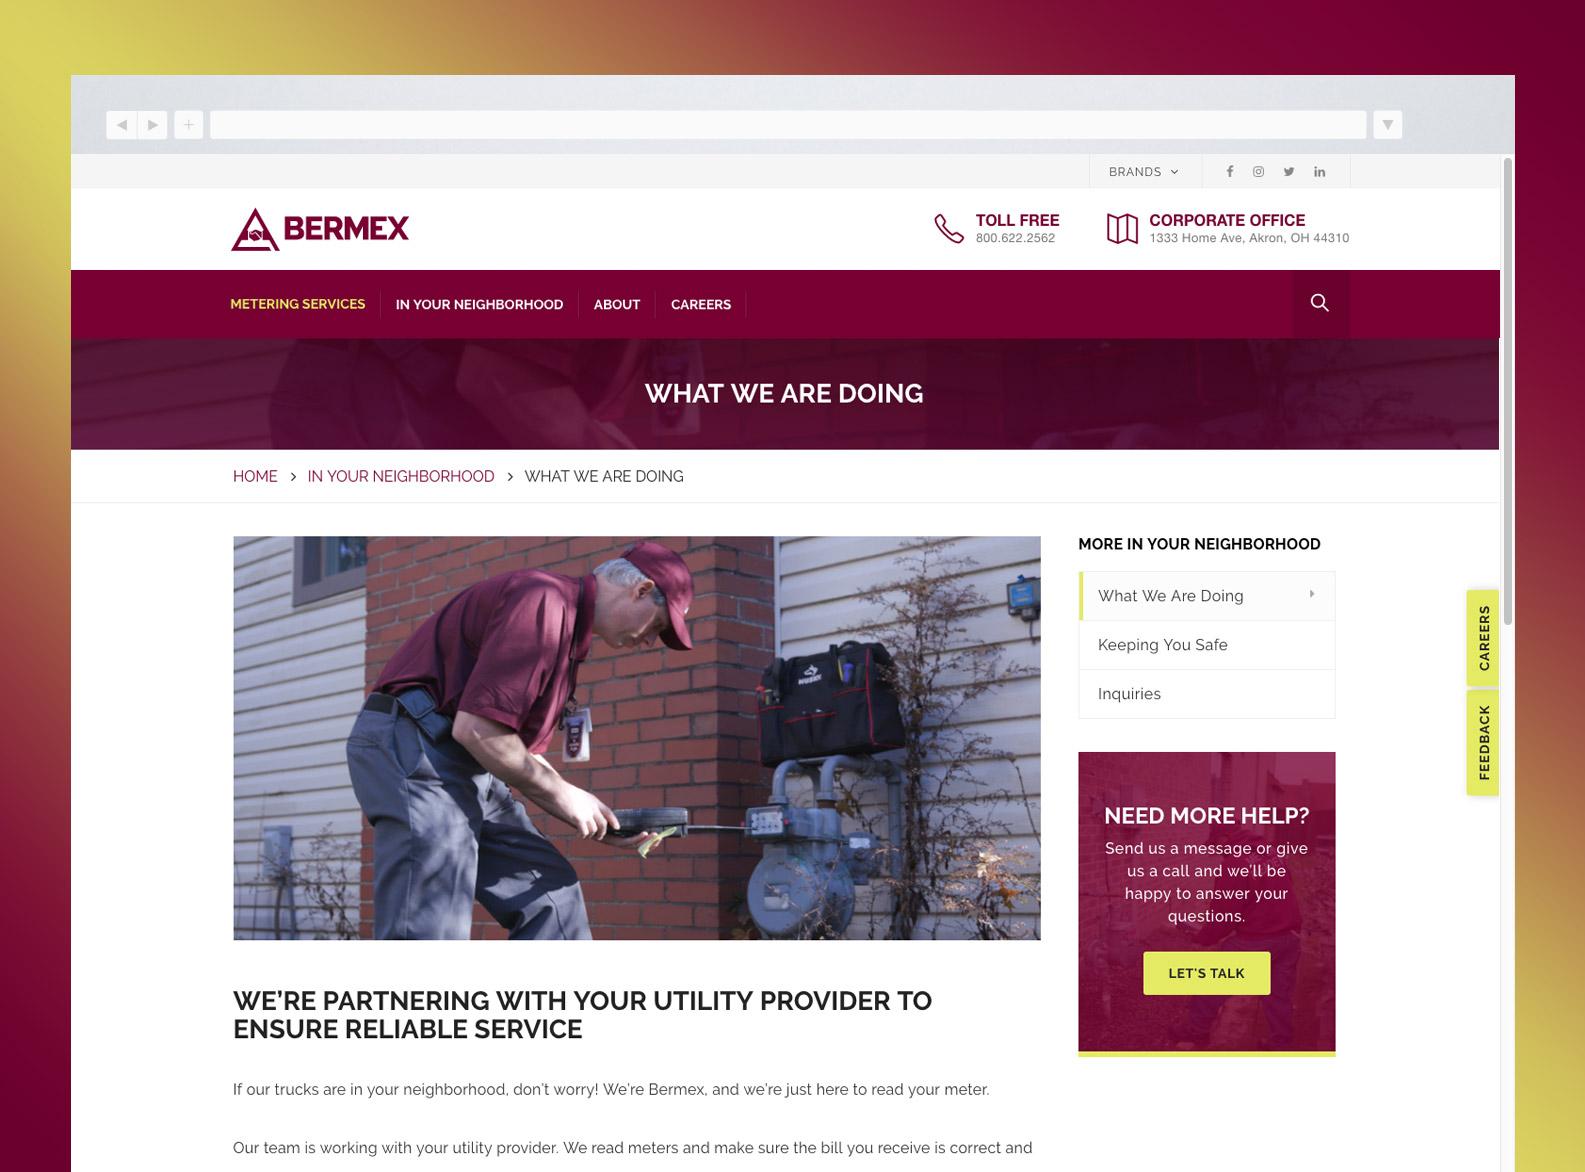 Bermex Service Detail page